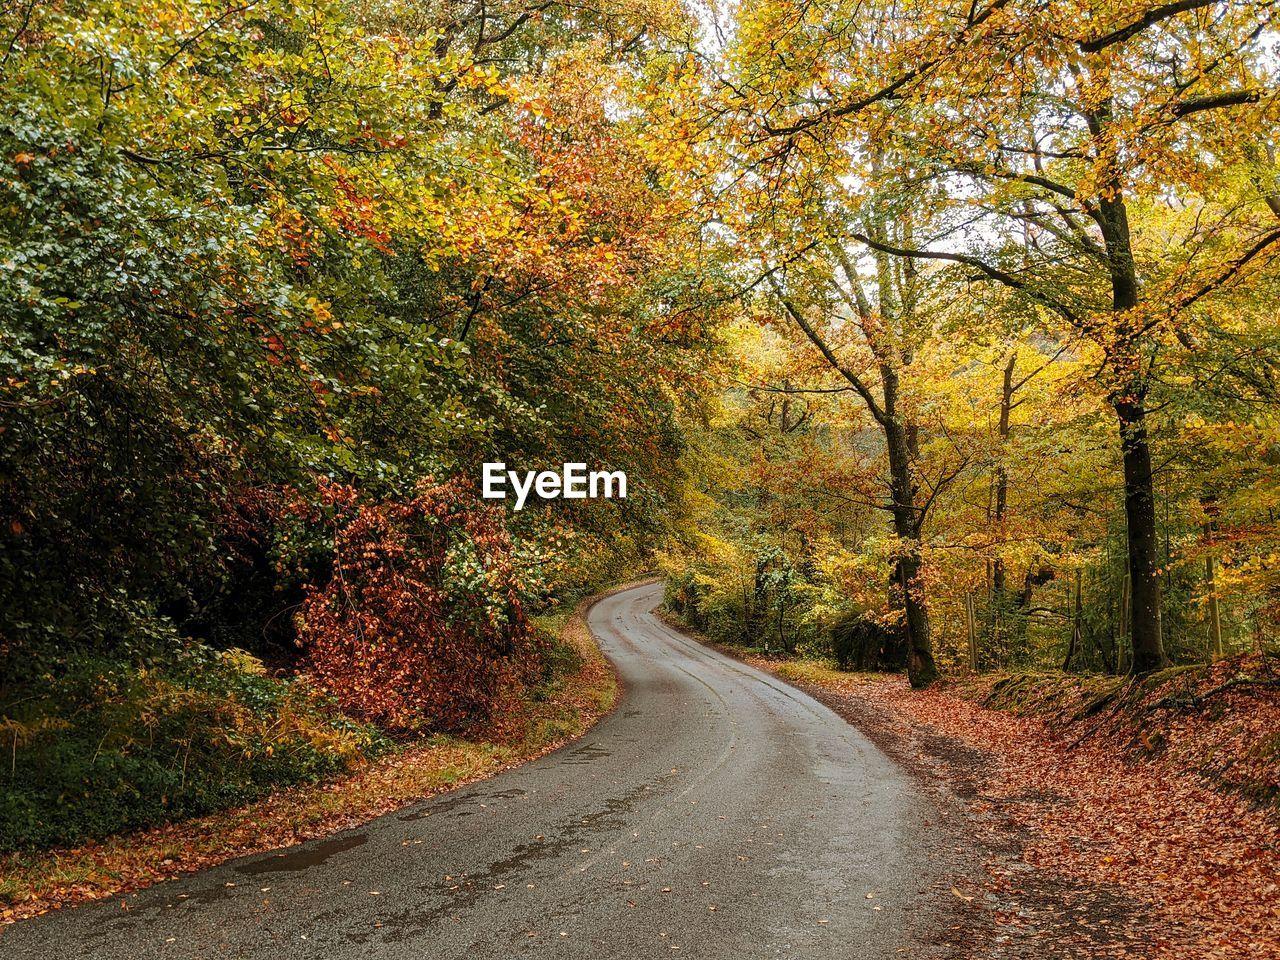 ROAD AMIDST TREES SEEN THROUGH AUTUMN LEAVES